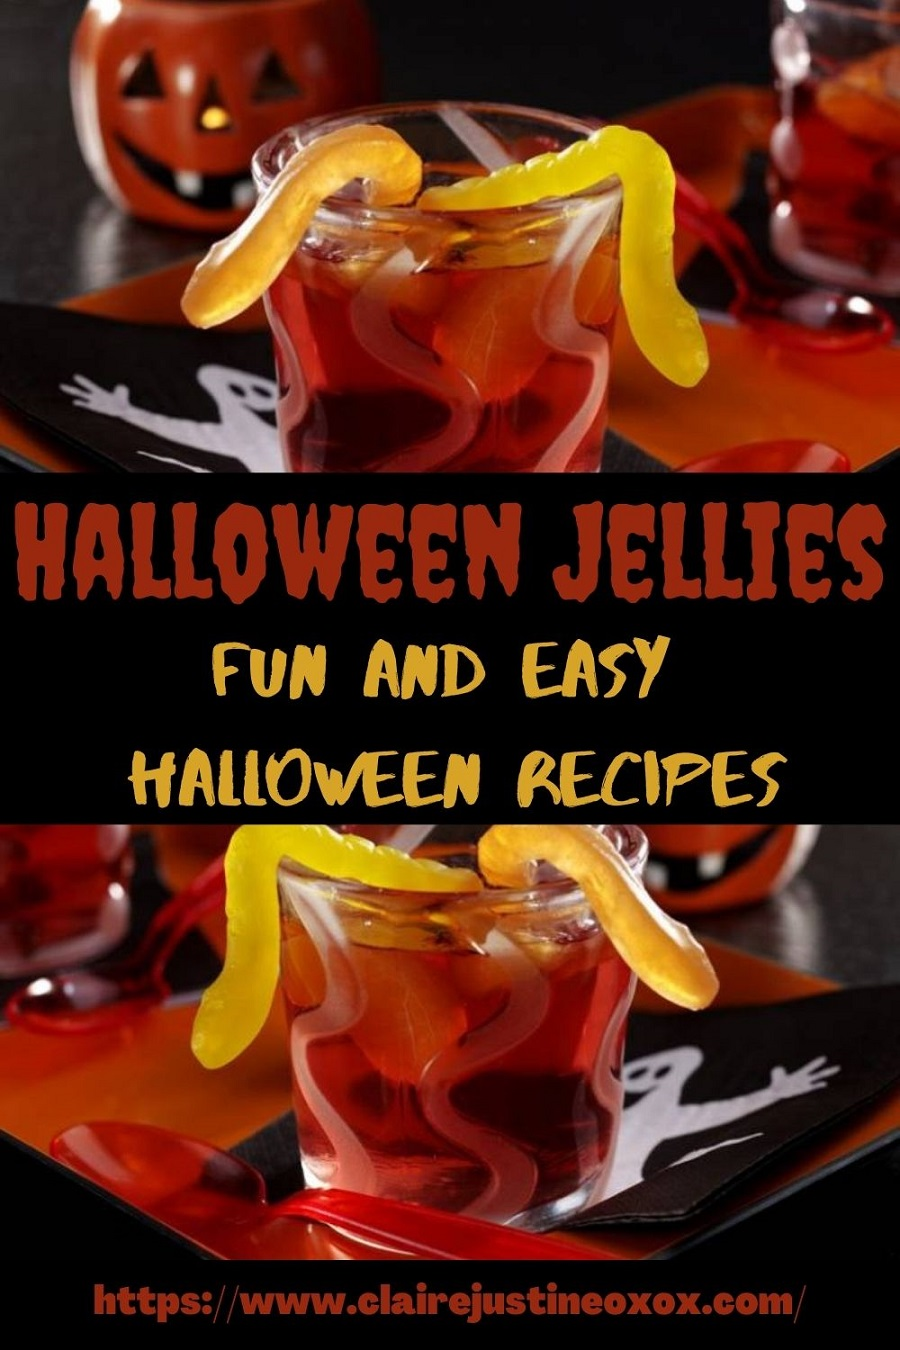 Halloween Jellies: Fun And Easy Halloween Recipes